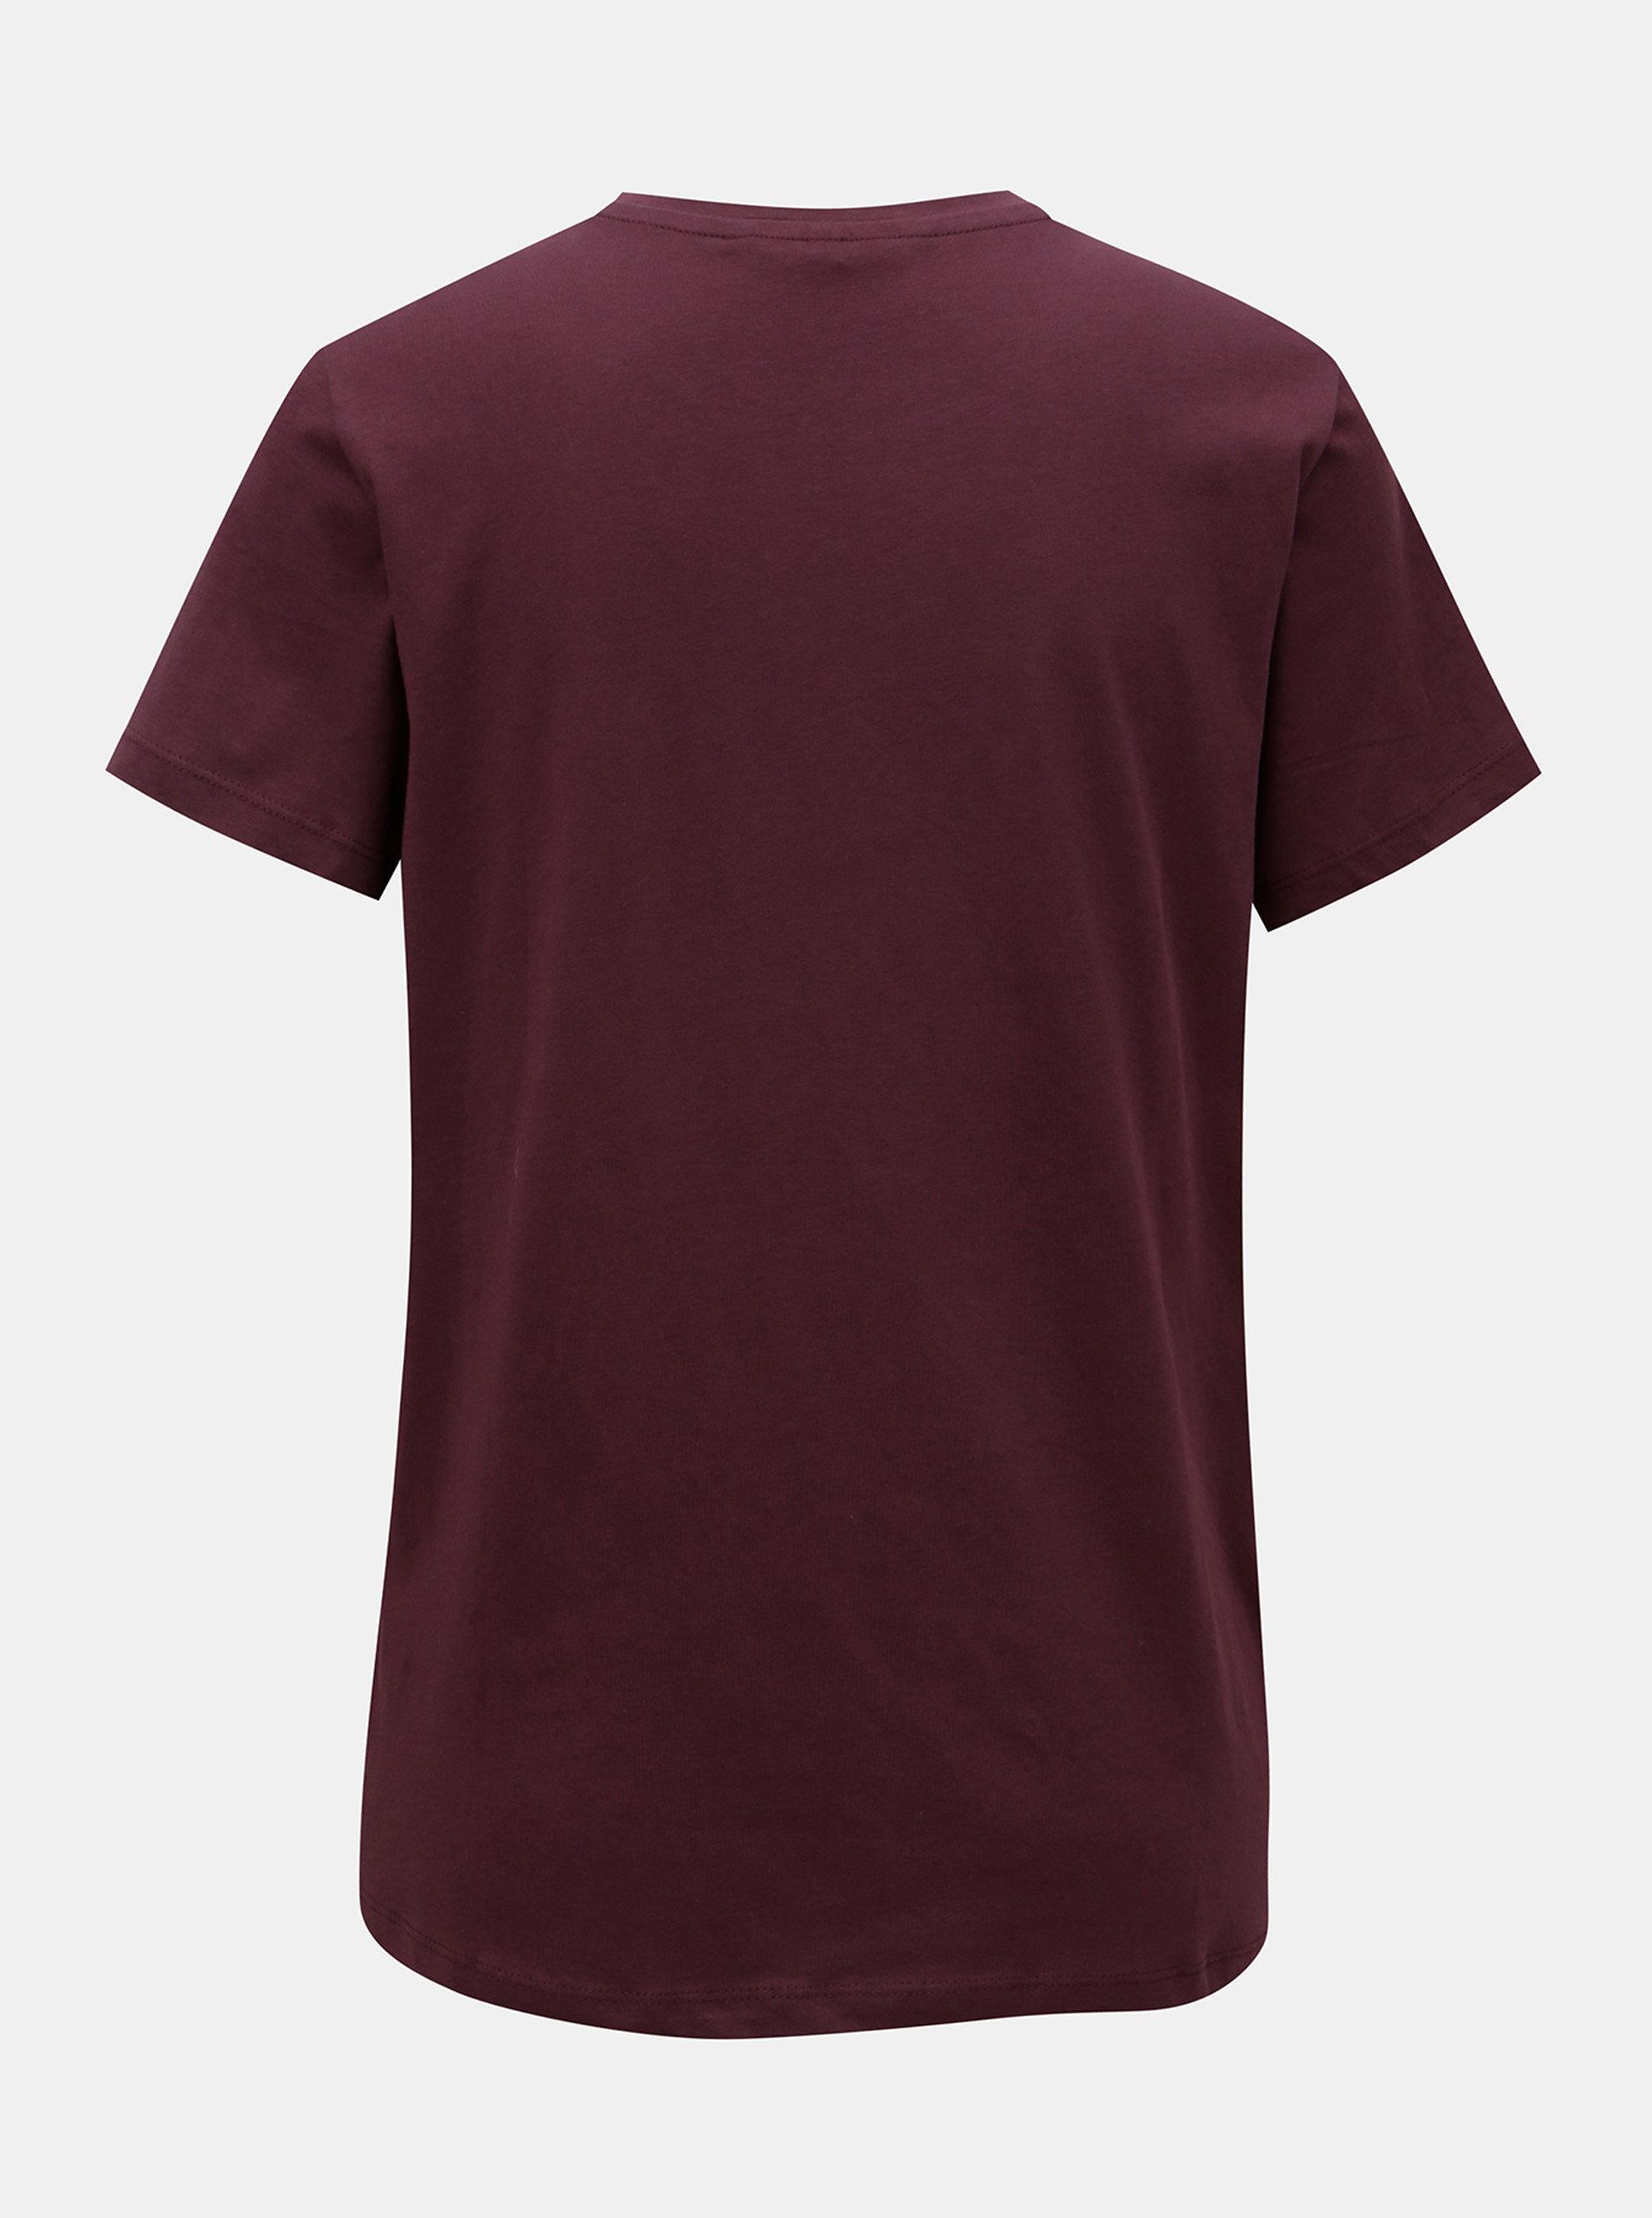 406fff9438d2 Vínové tričko s aplikací VERO MODA ...